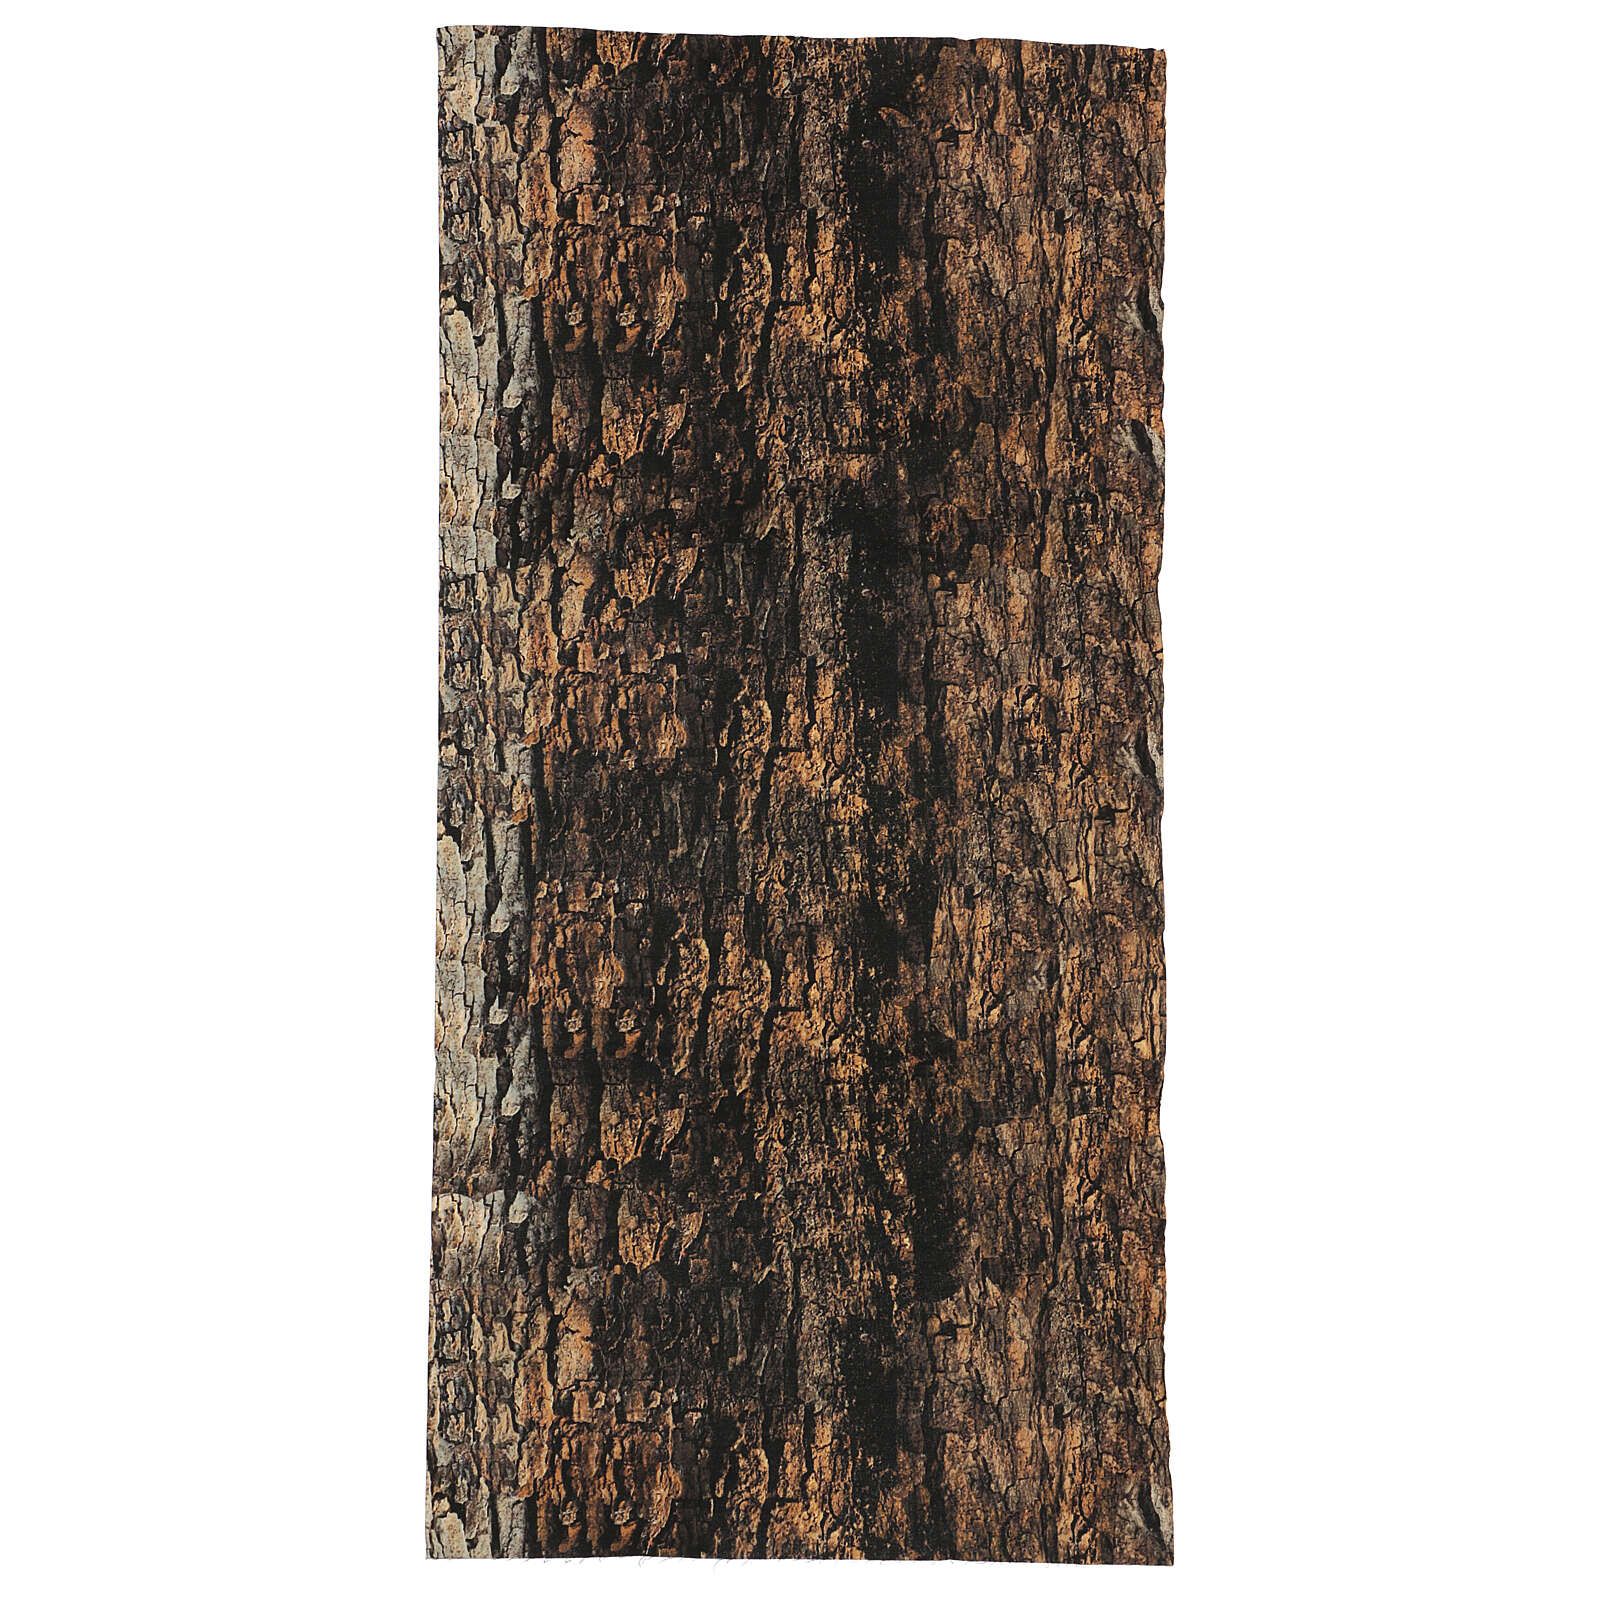 Tree bark paper shapeable 60x30 cm for nativity scene 4